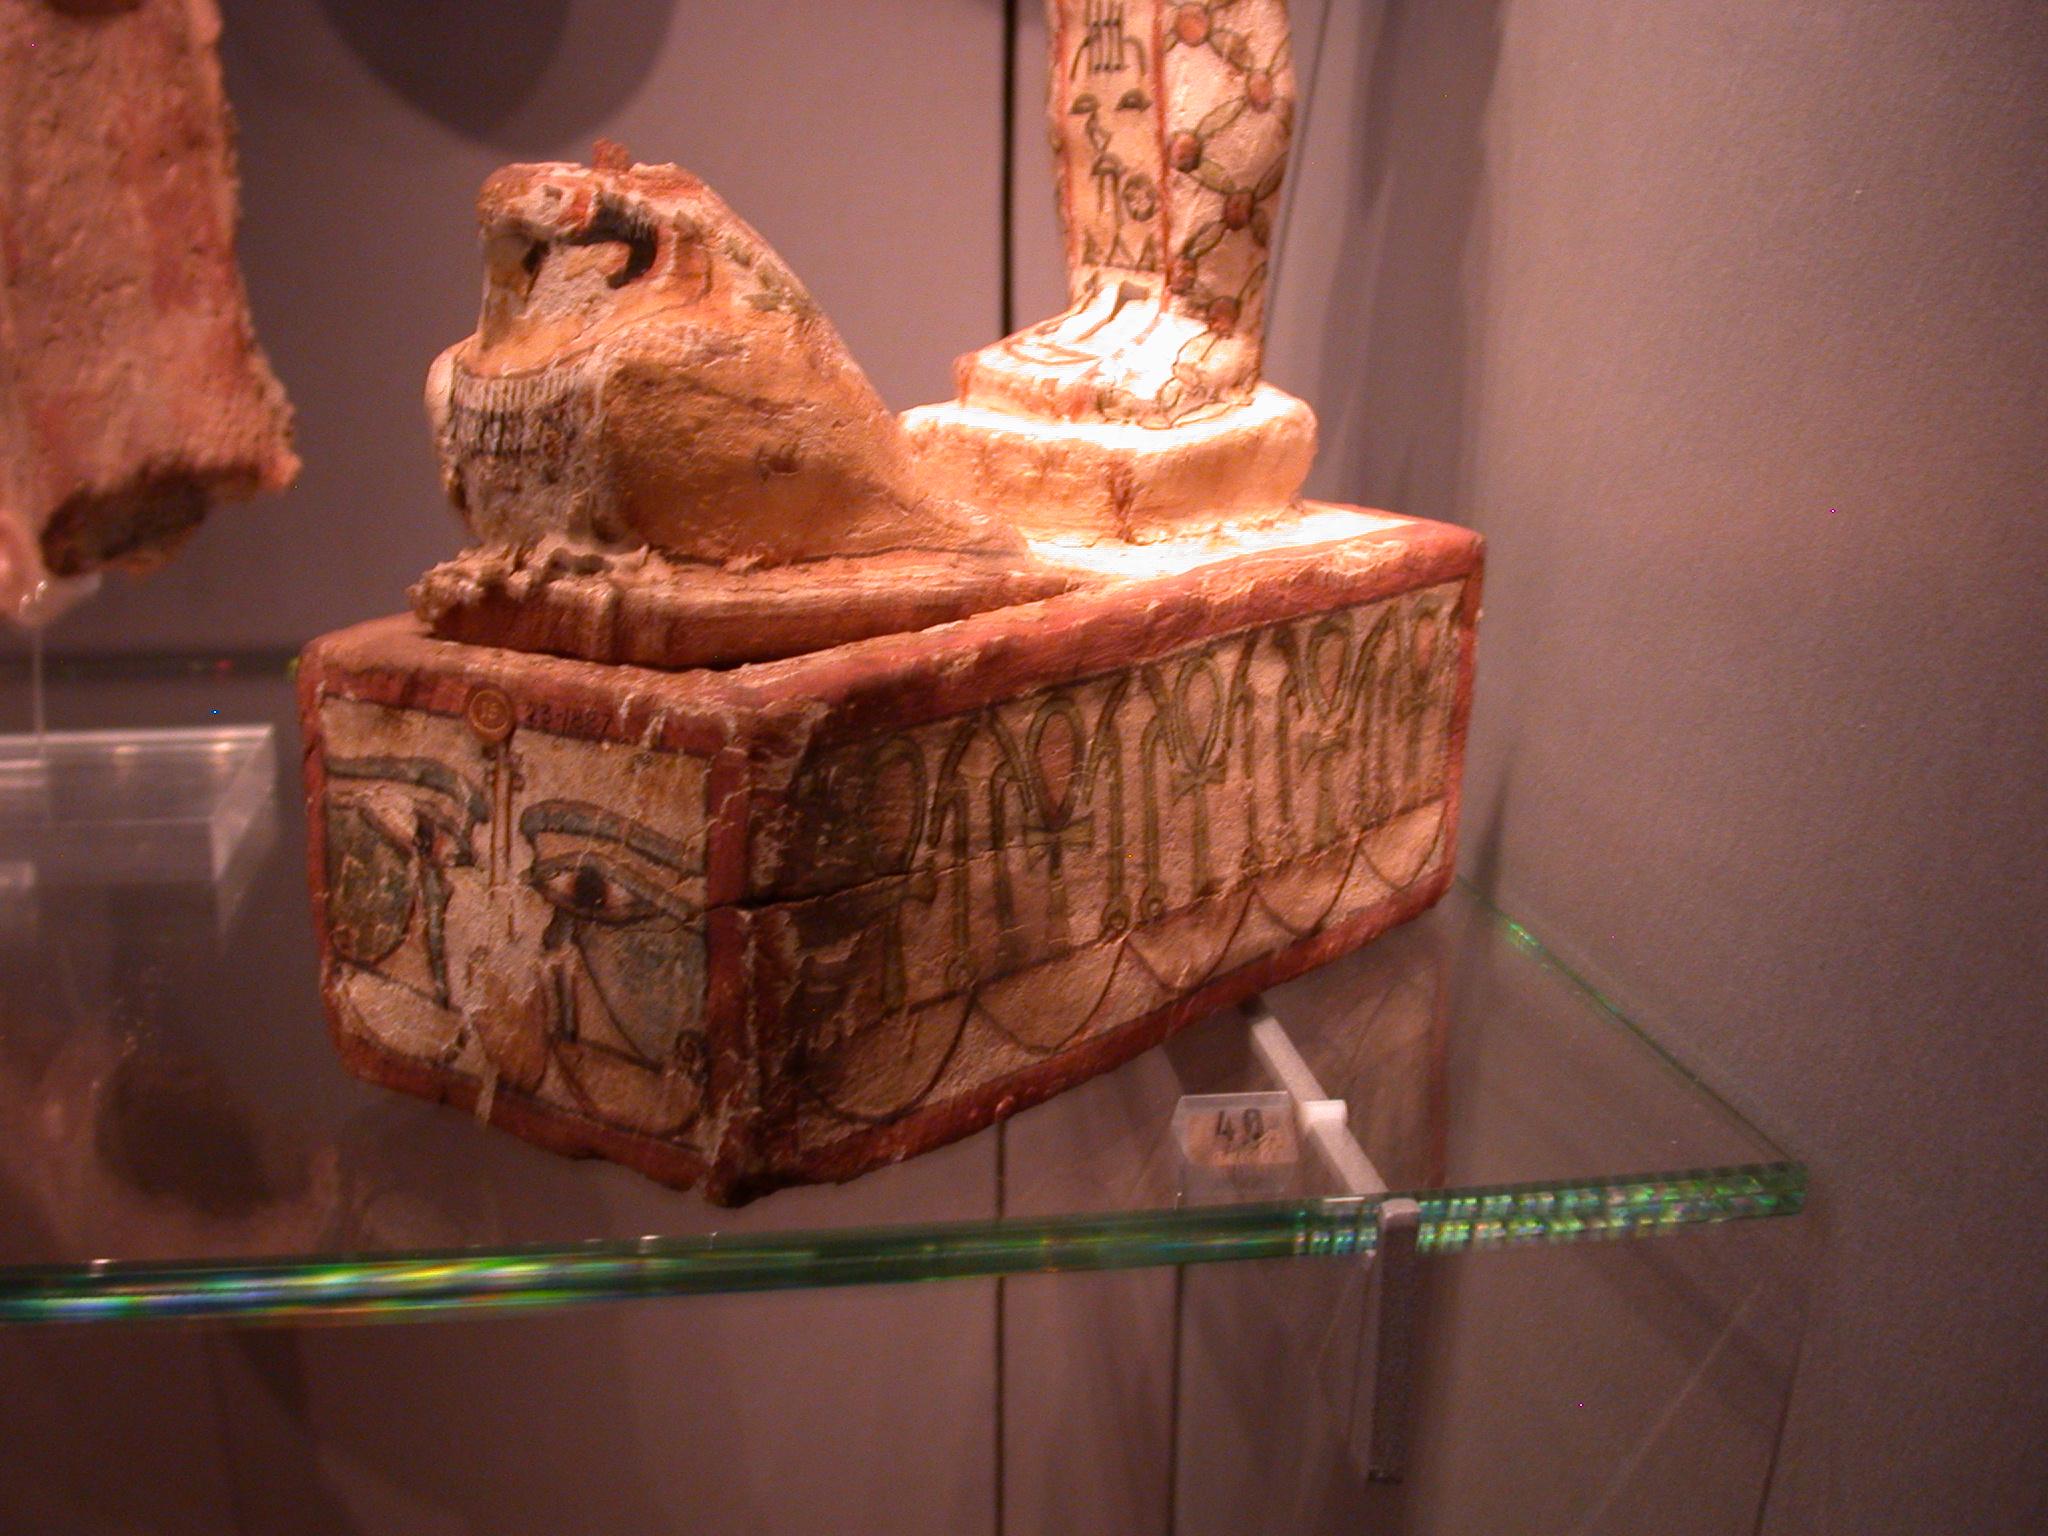 Wood Ptah-Sokar-Osiris Box Containing Papyrus Scroll, Late Period, 746-336 BCE, Egypt, Fitzwilliam Museum, Cambridge, England